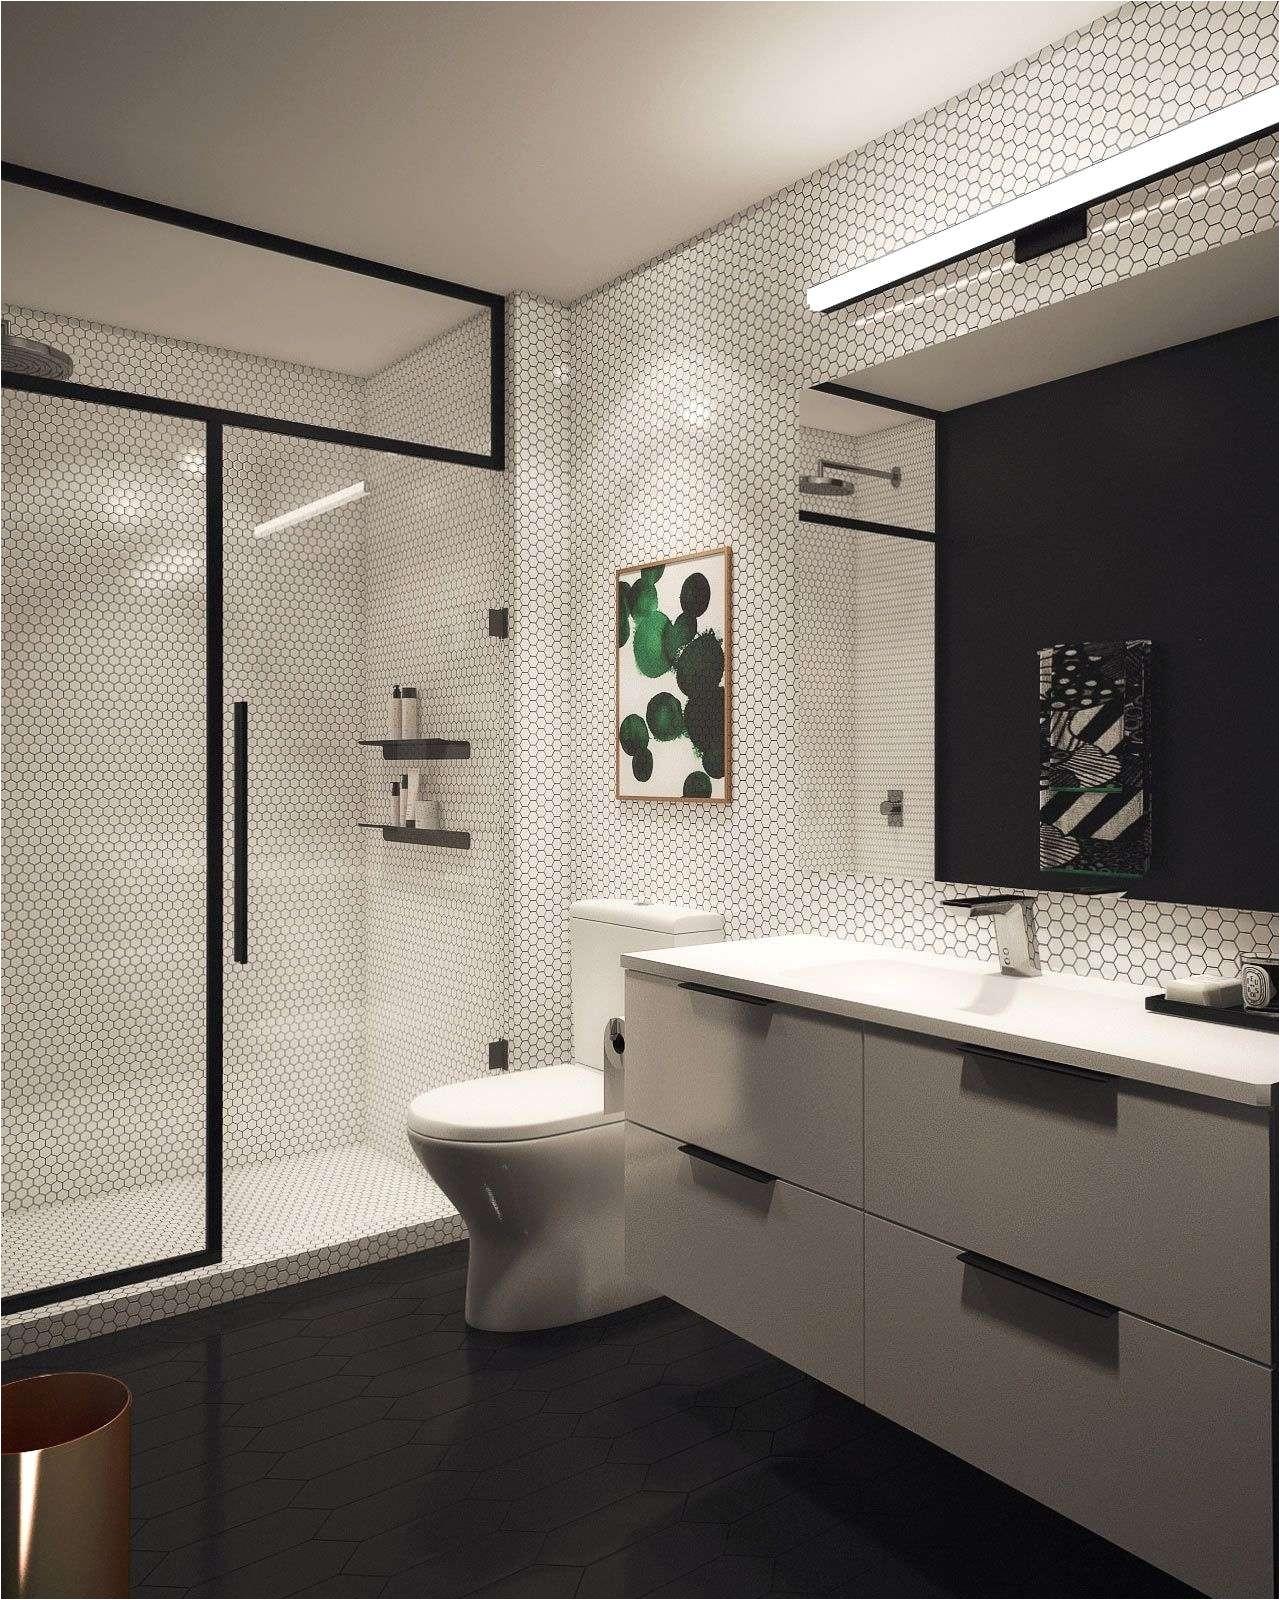 Fair Interior Design Bathroom Lovely Small Bathroom Lighting Fresh Tag Toilet Ideas 0d Best Design